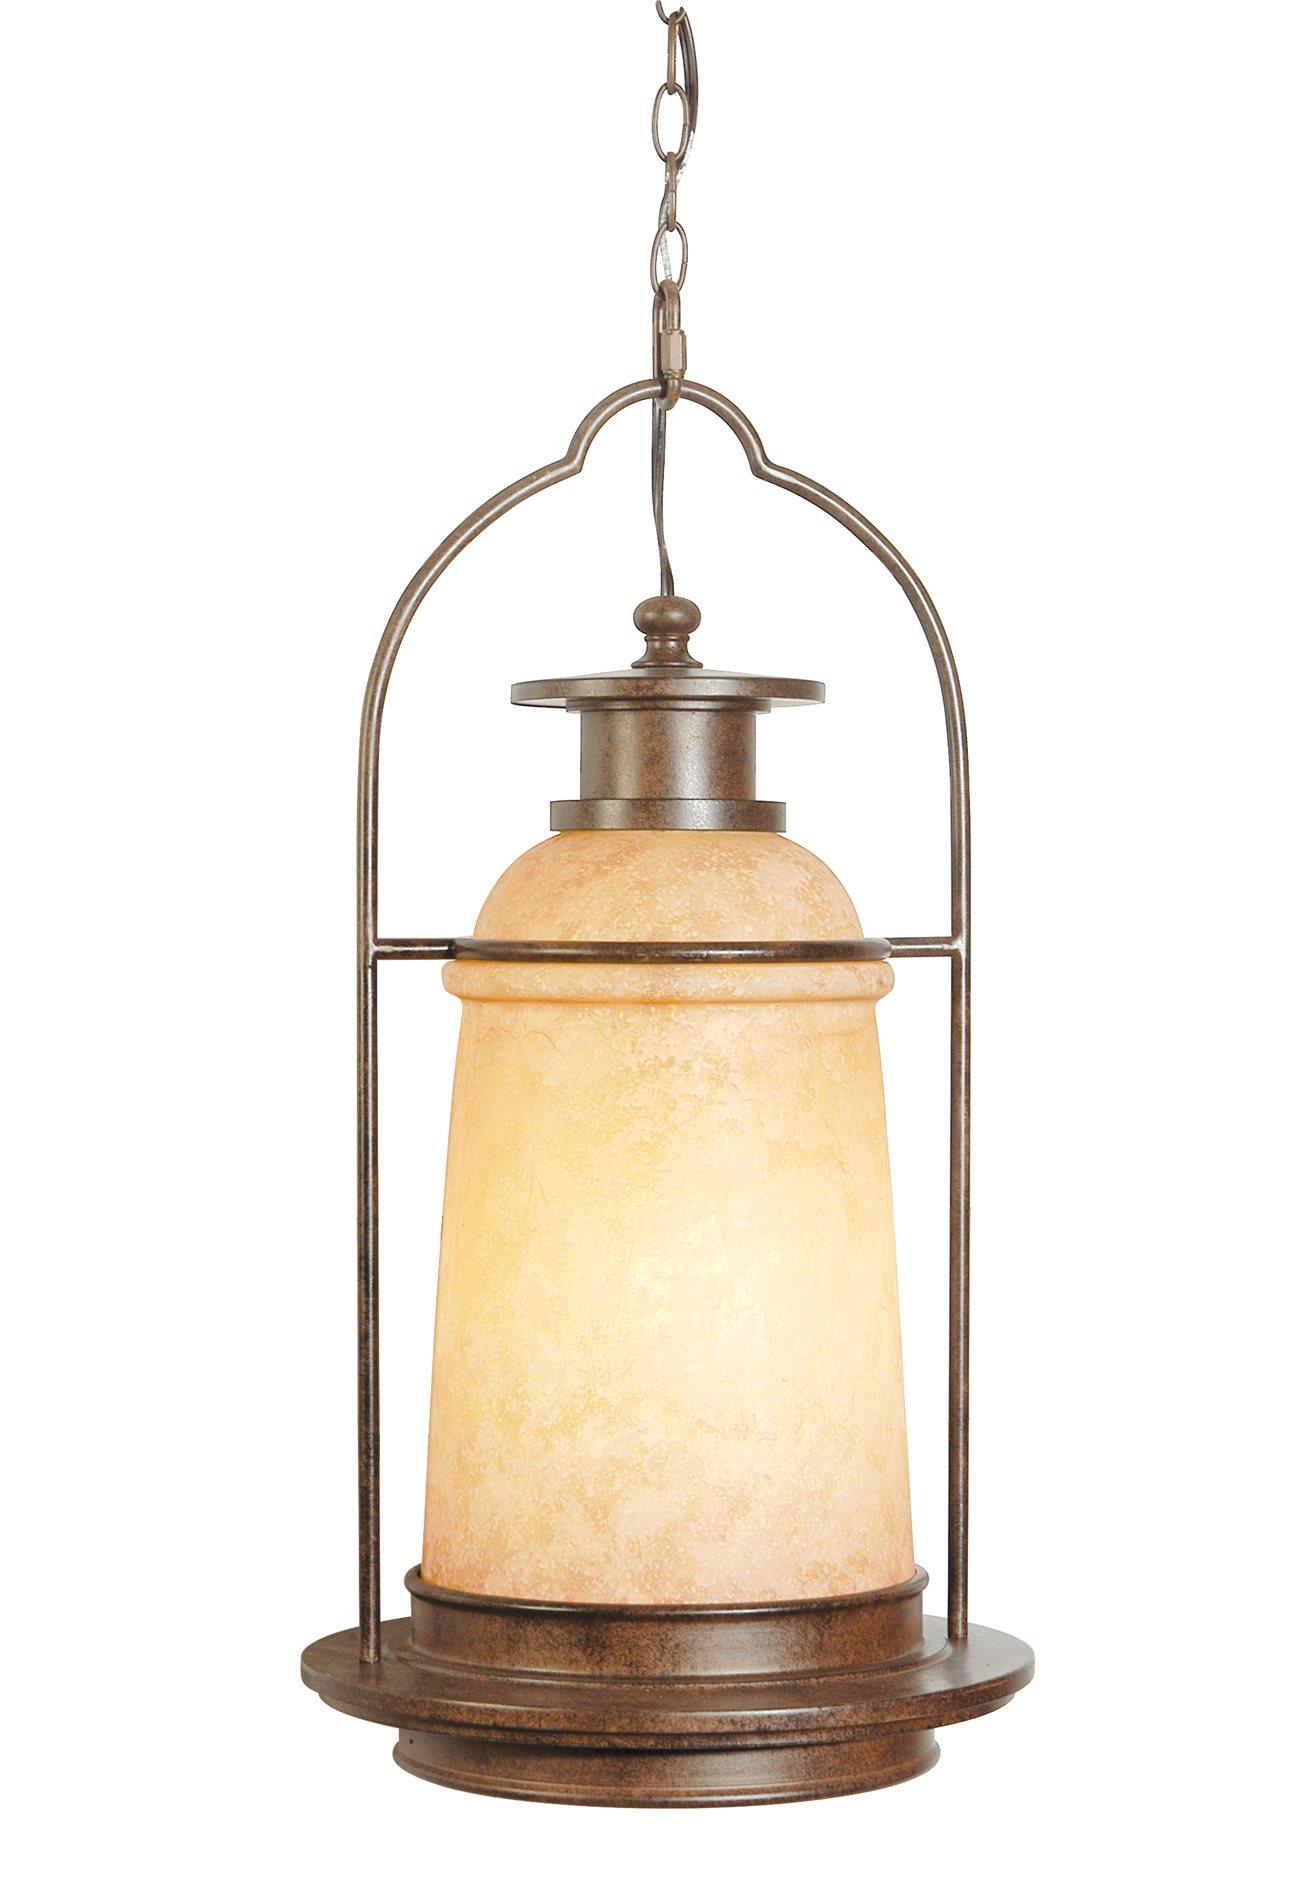 craftmade outdoor lighting outdoor ceiling craftmade portofino aged bronze large pendant outdoor lighting z472198